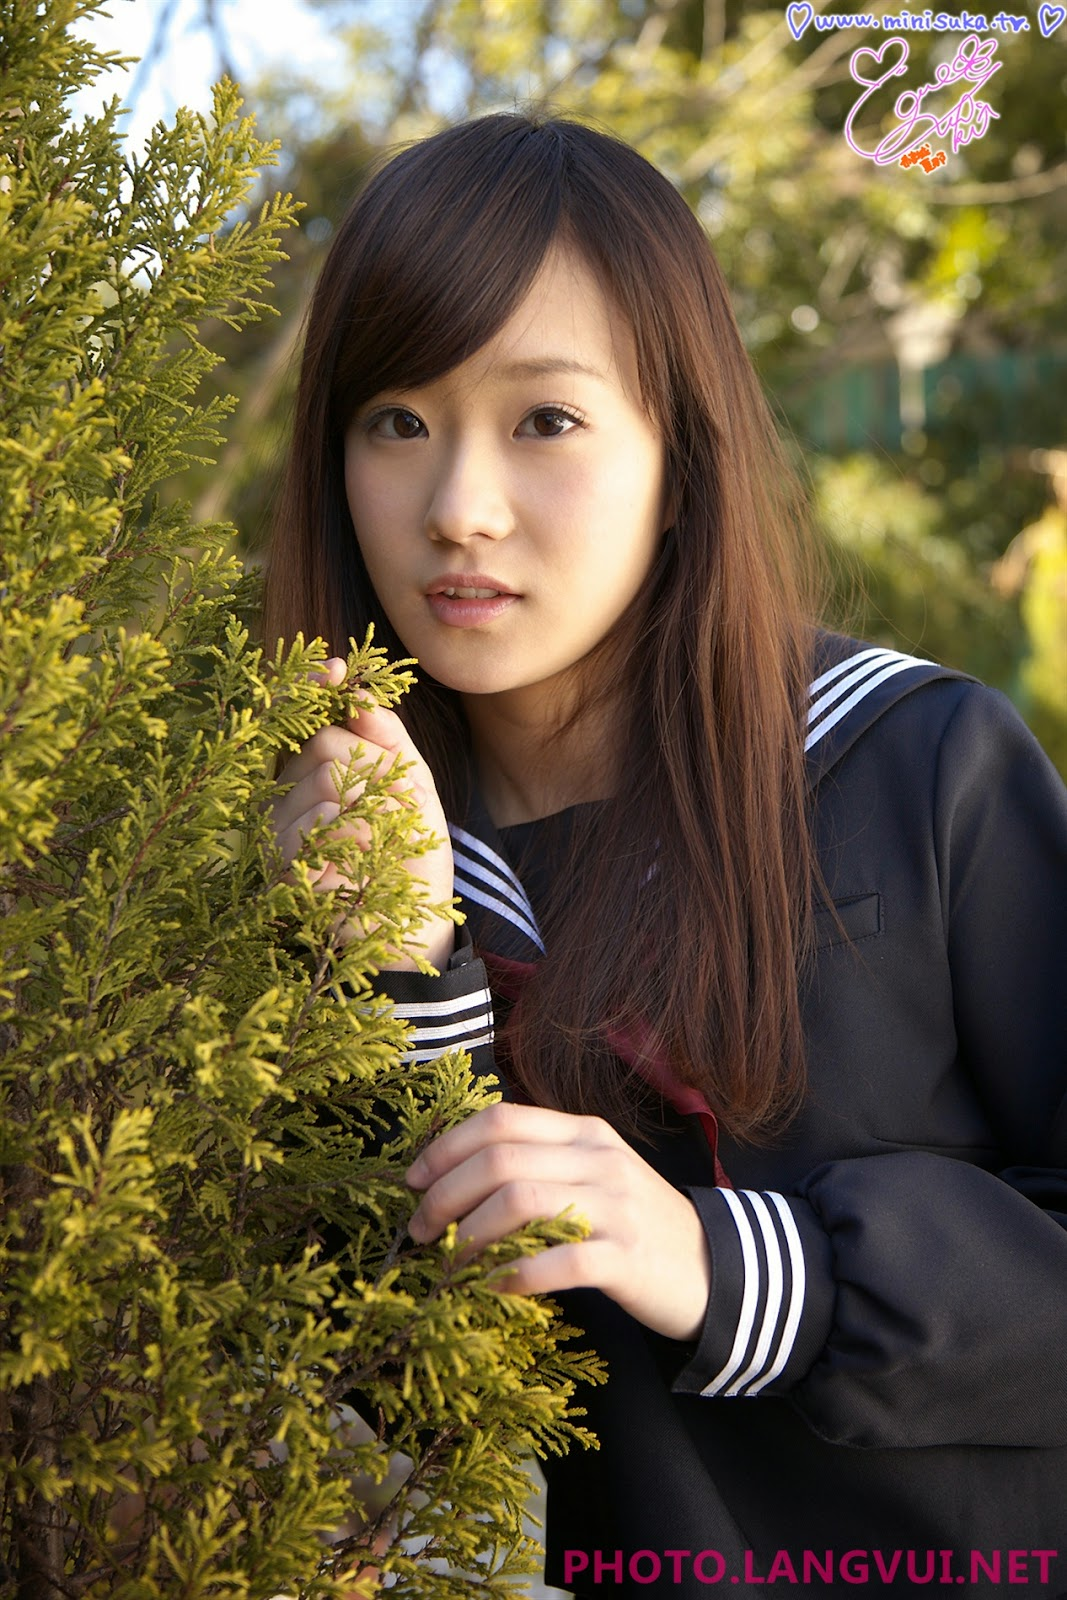 Minisuka kana 04032011 part1